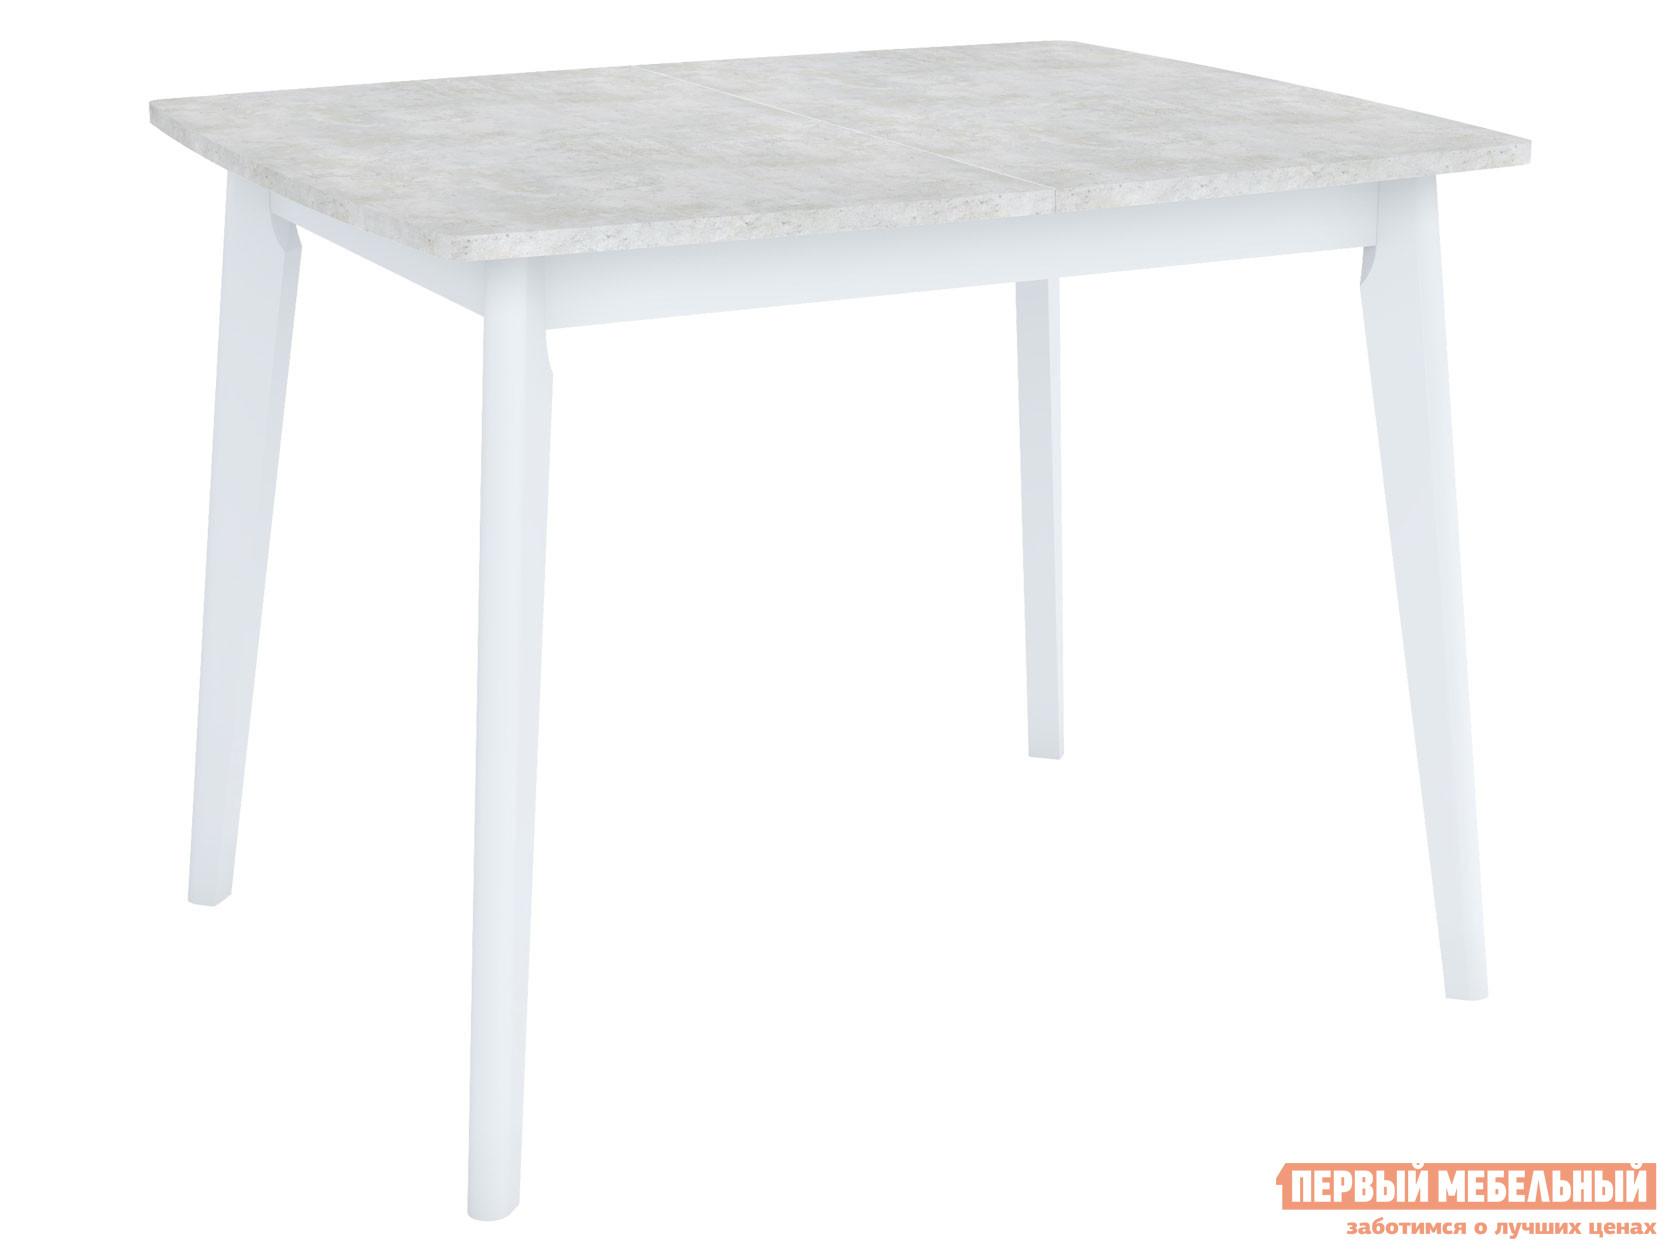 Кухонный стол  Обеденный Vesteros 1200 Бетон лайт / Белый, Малый Stolmann 137725